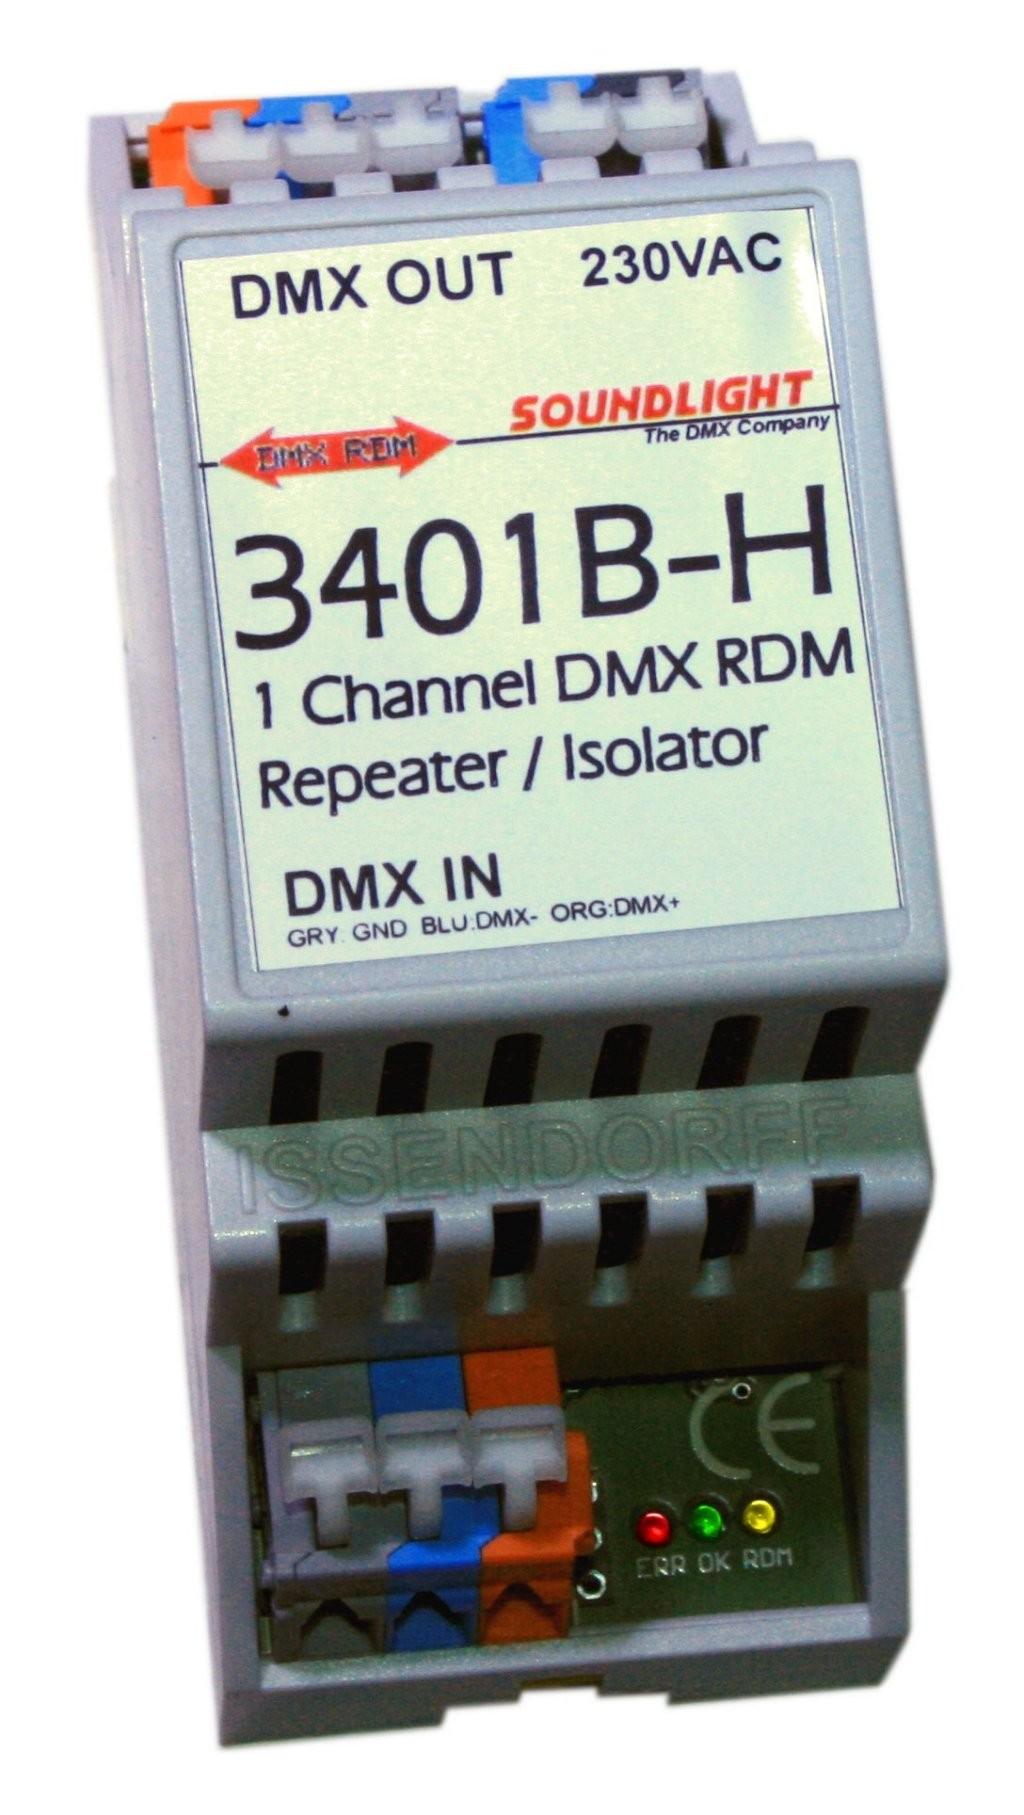 3801B-H   DMX DALI bus Interface 5 dali adress/groups   RDM